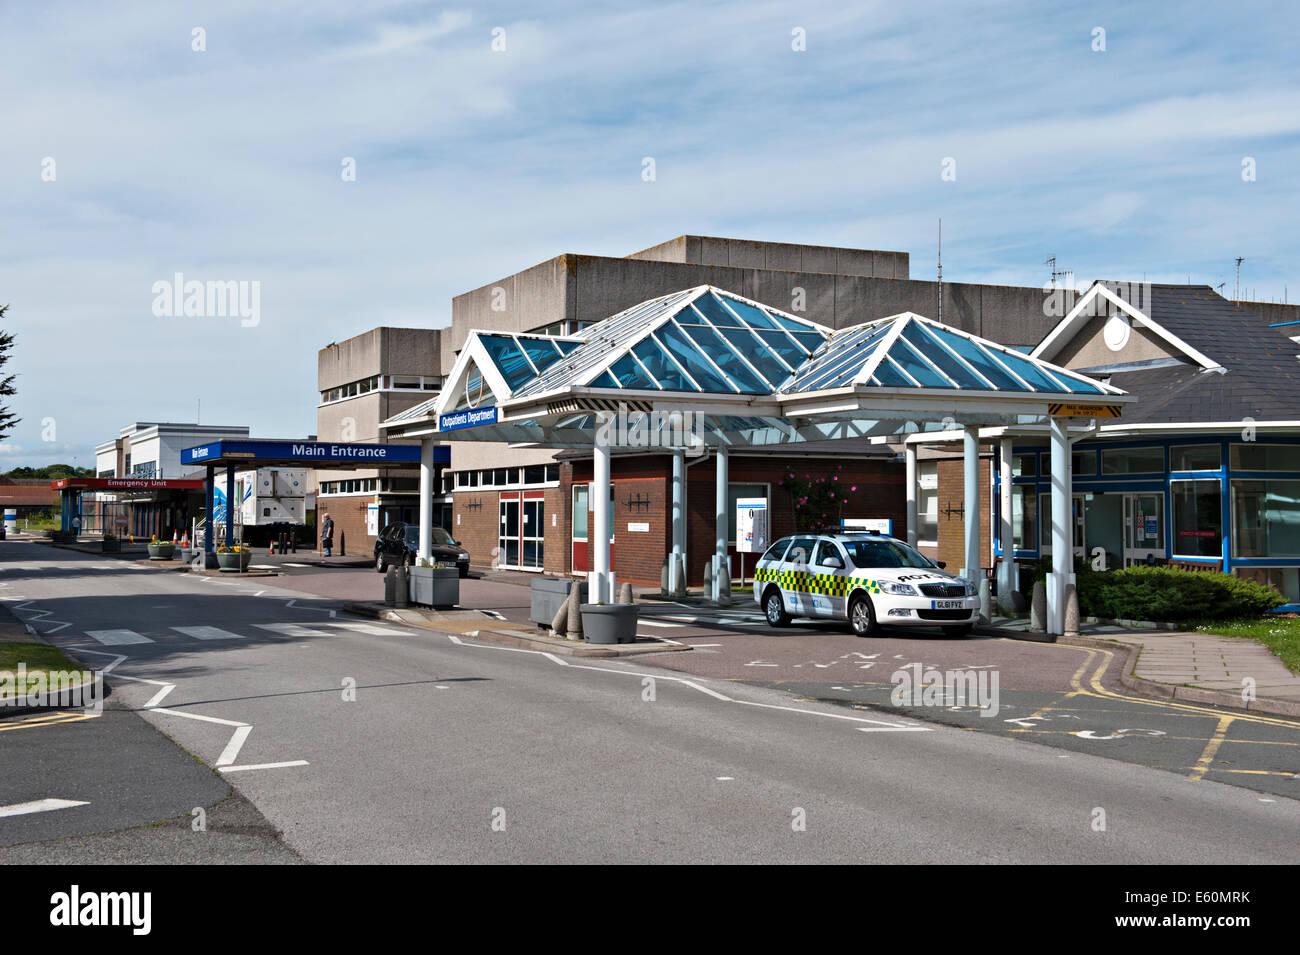 Outpatients Department at Eastbourne District General Hospital, UK - Stock Image